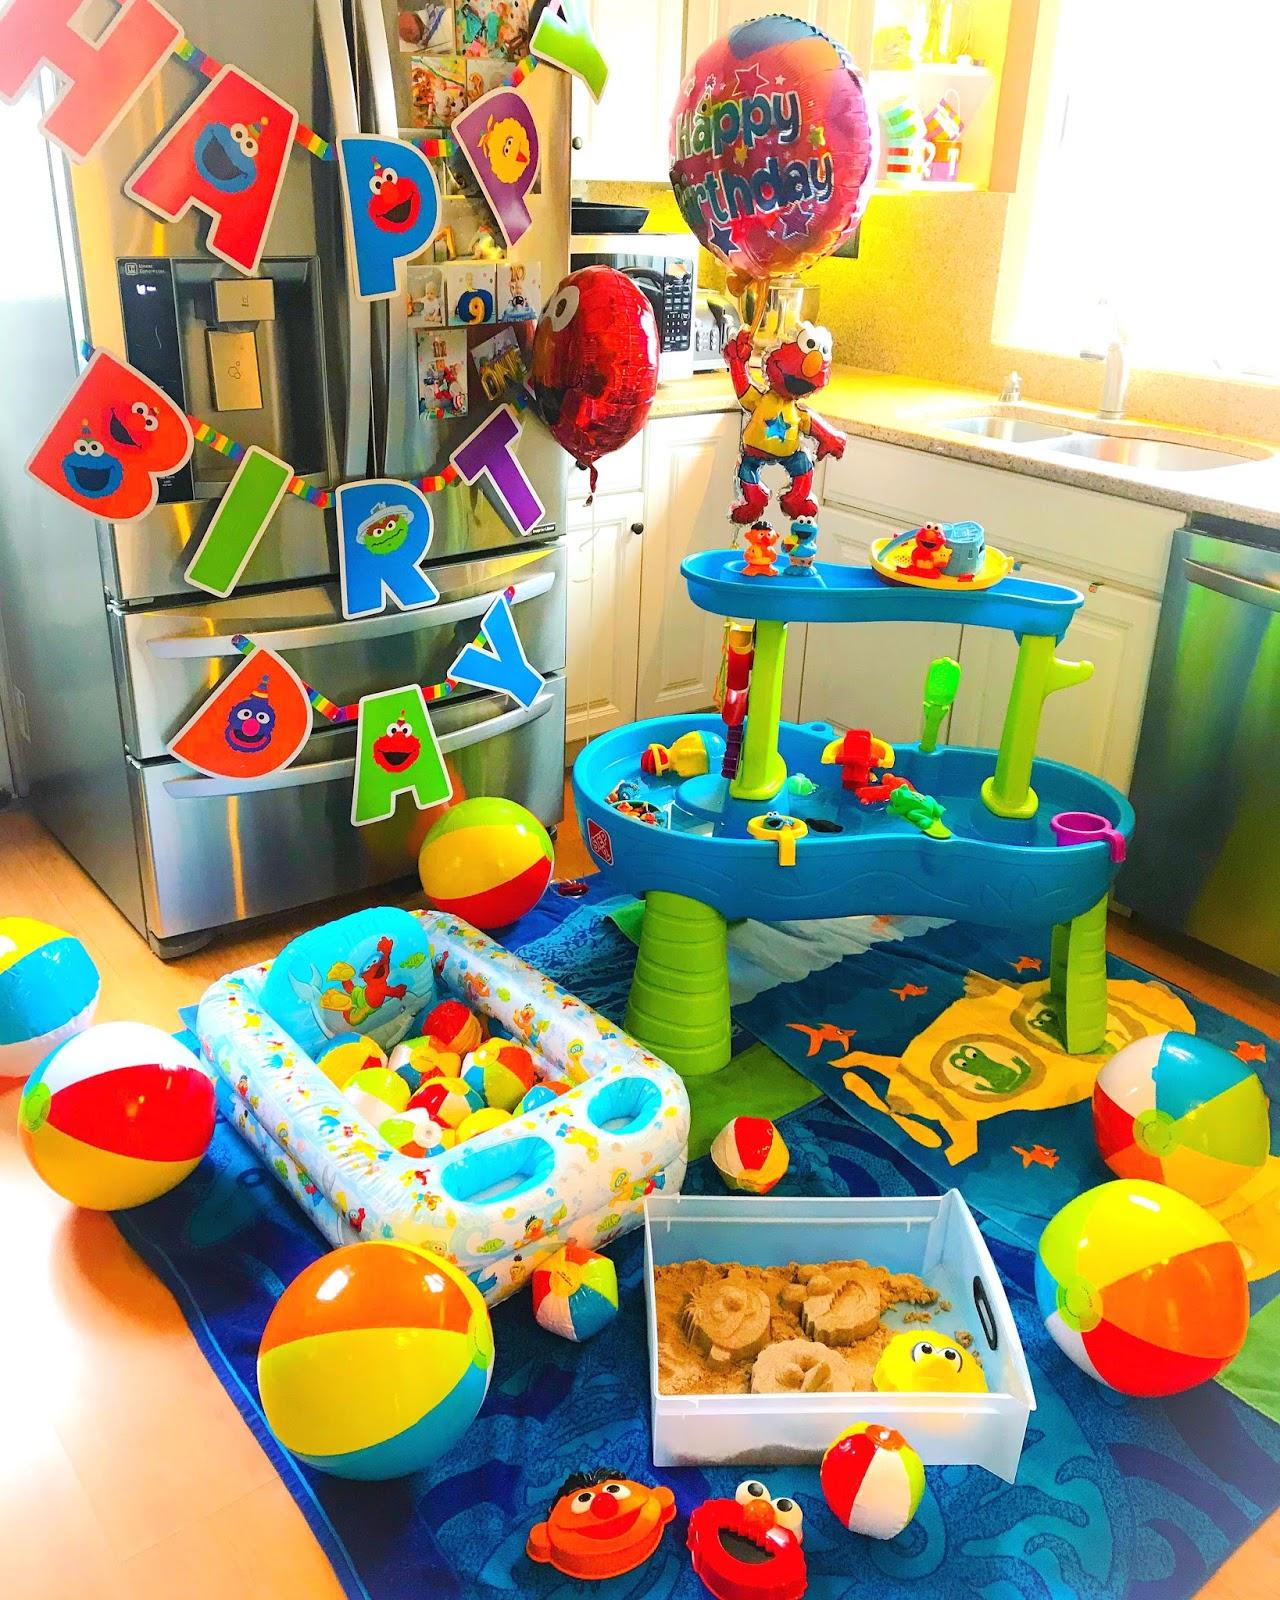 doo-dah!: An Indoor Beach Party For Elmo's Birthday